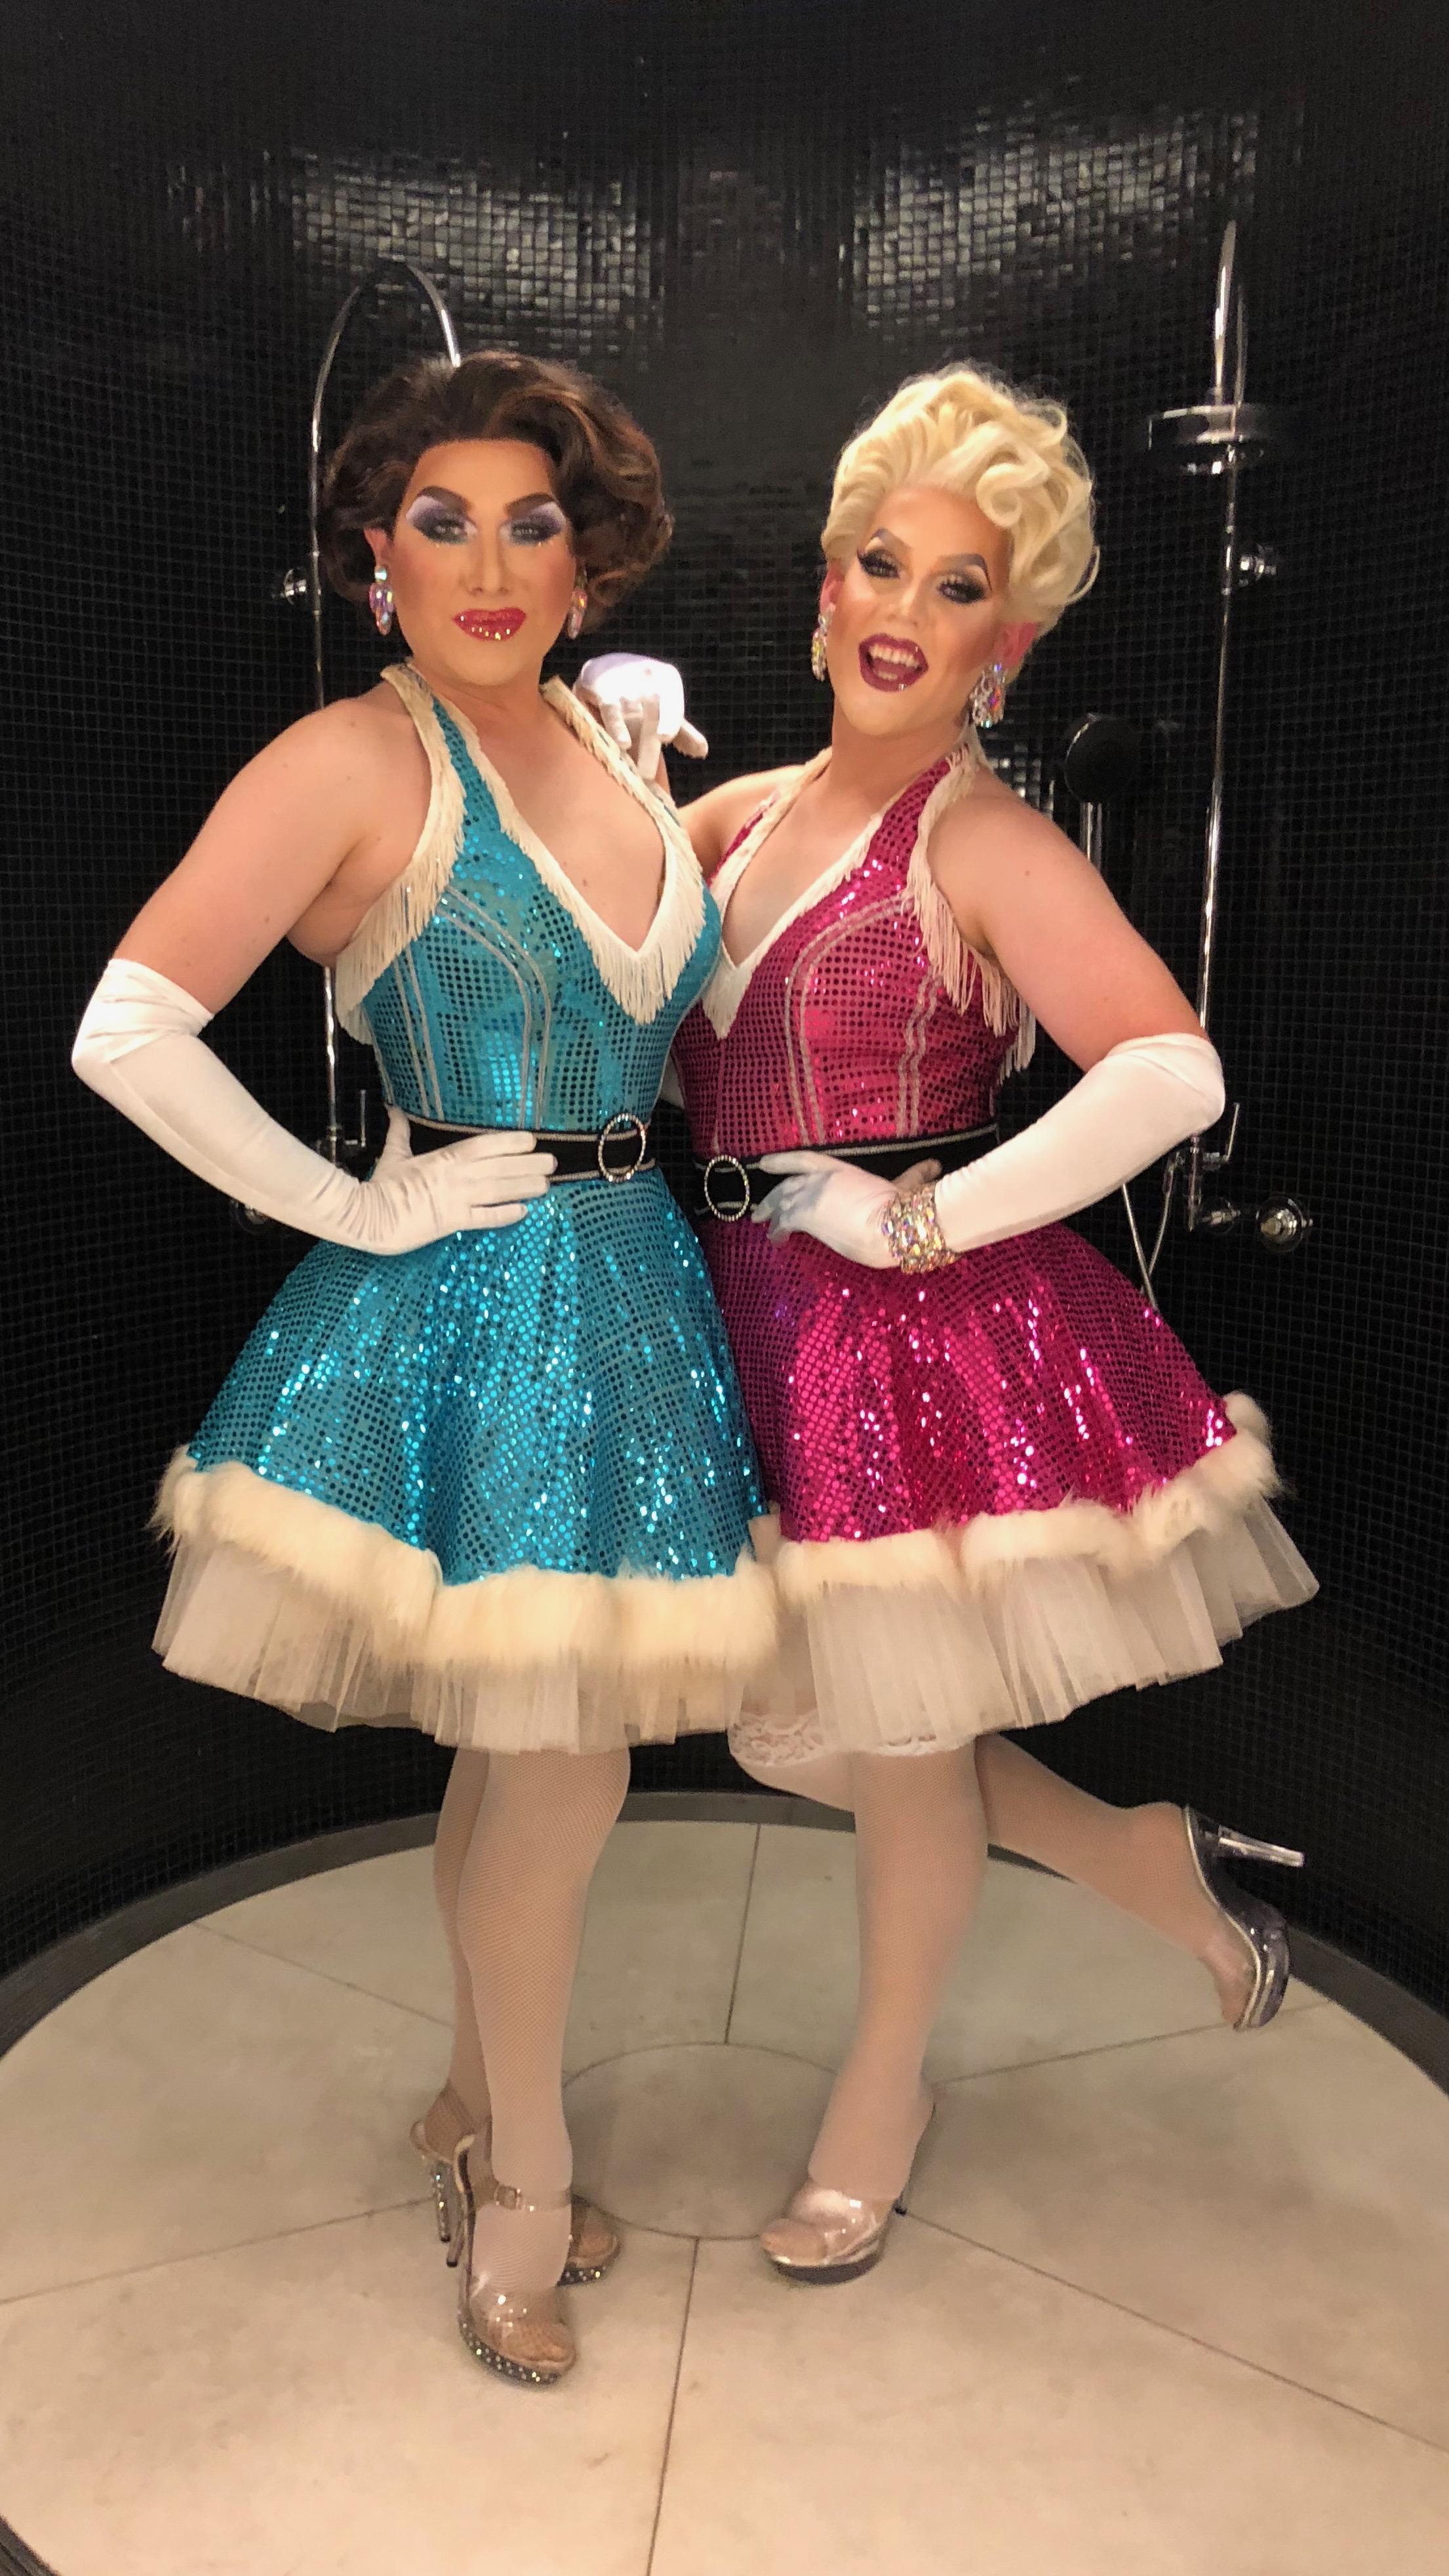 Charisma Belle and Carmen Geddit